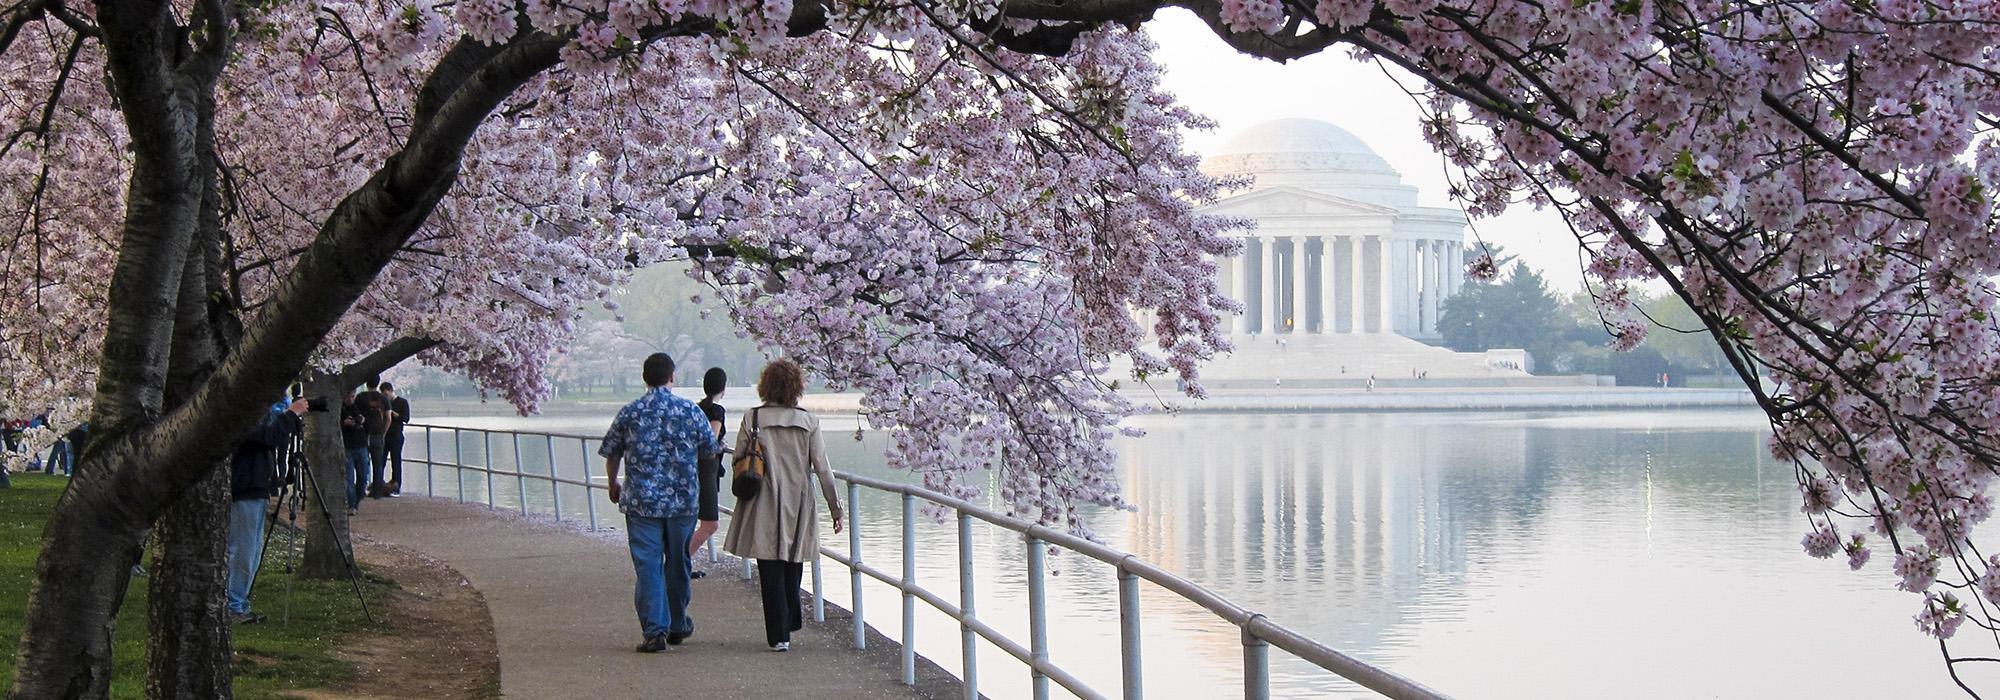 CherryBlossoms_hero_CharlesBirnbaum_2012.jpg